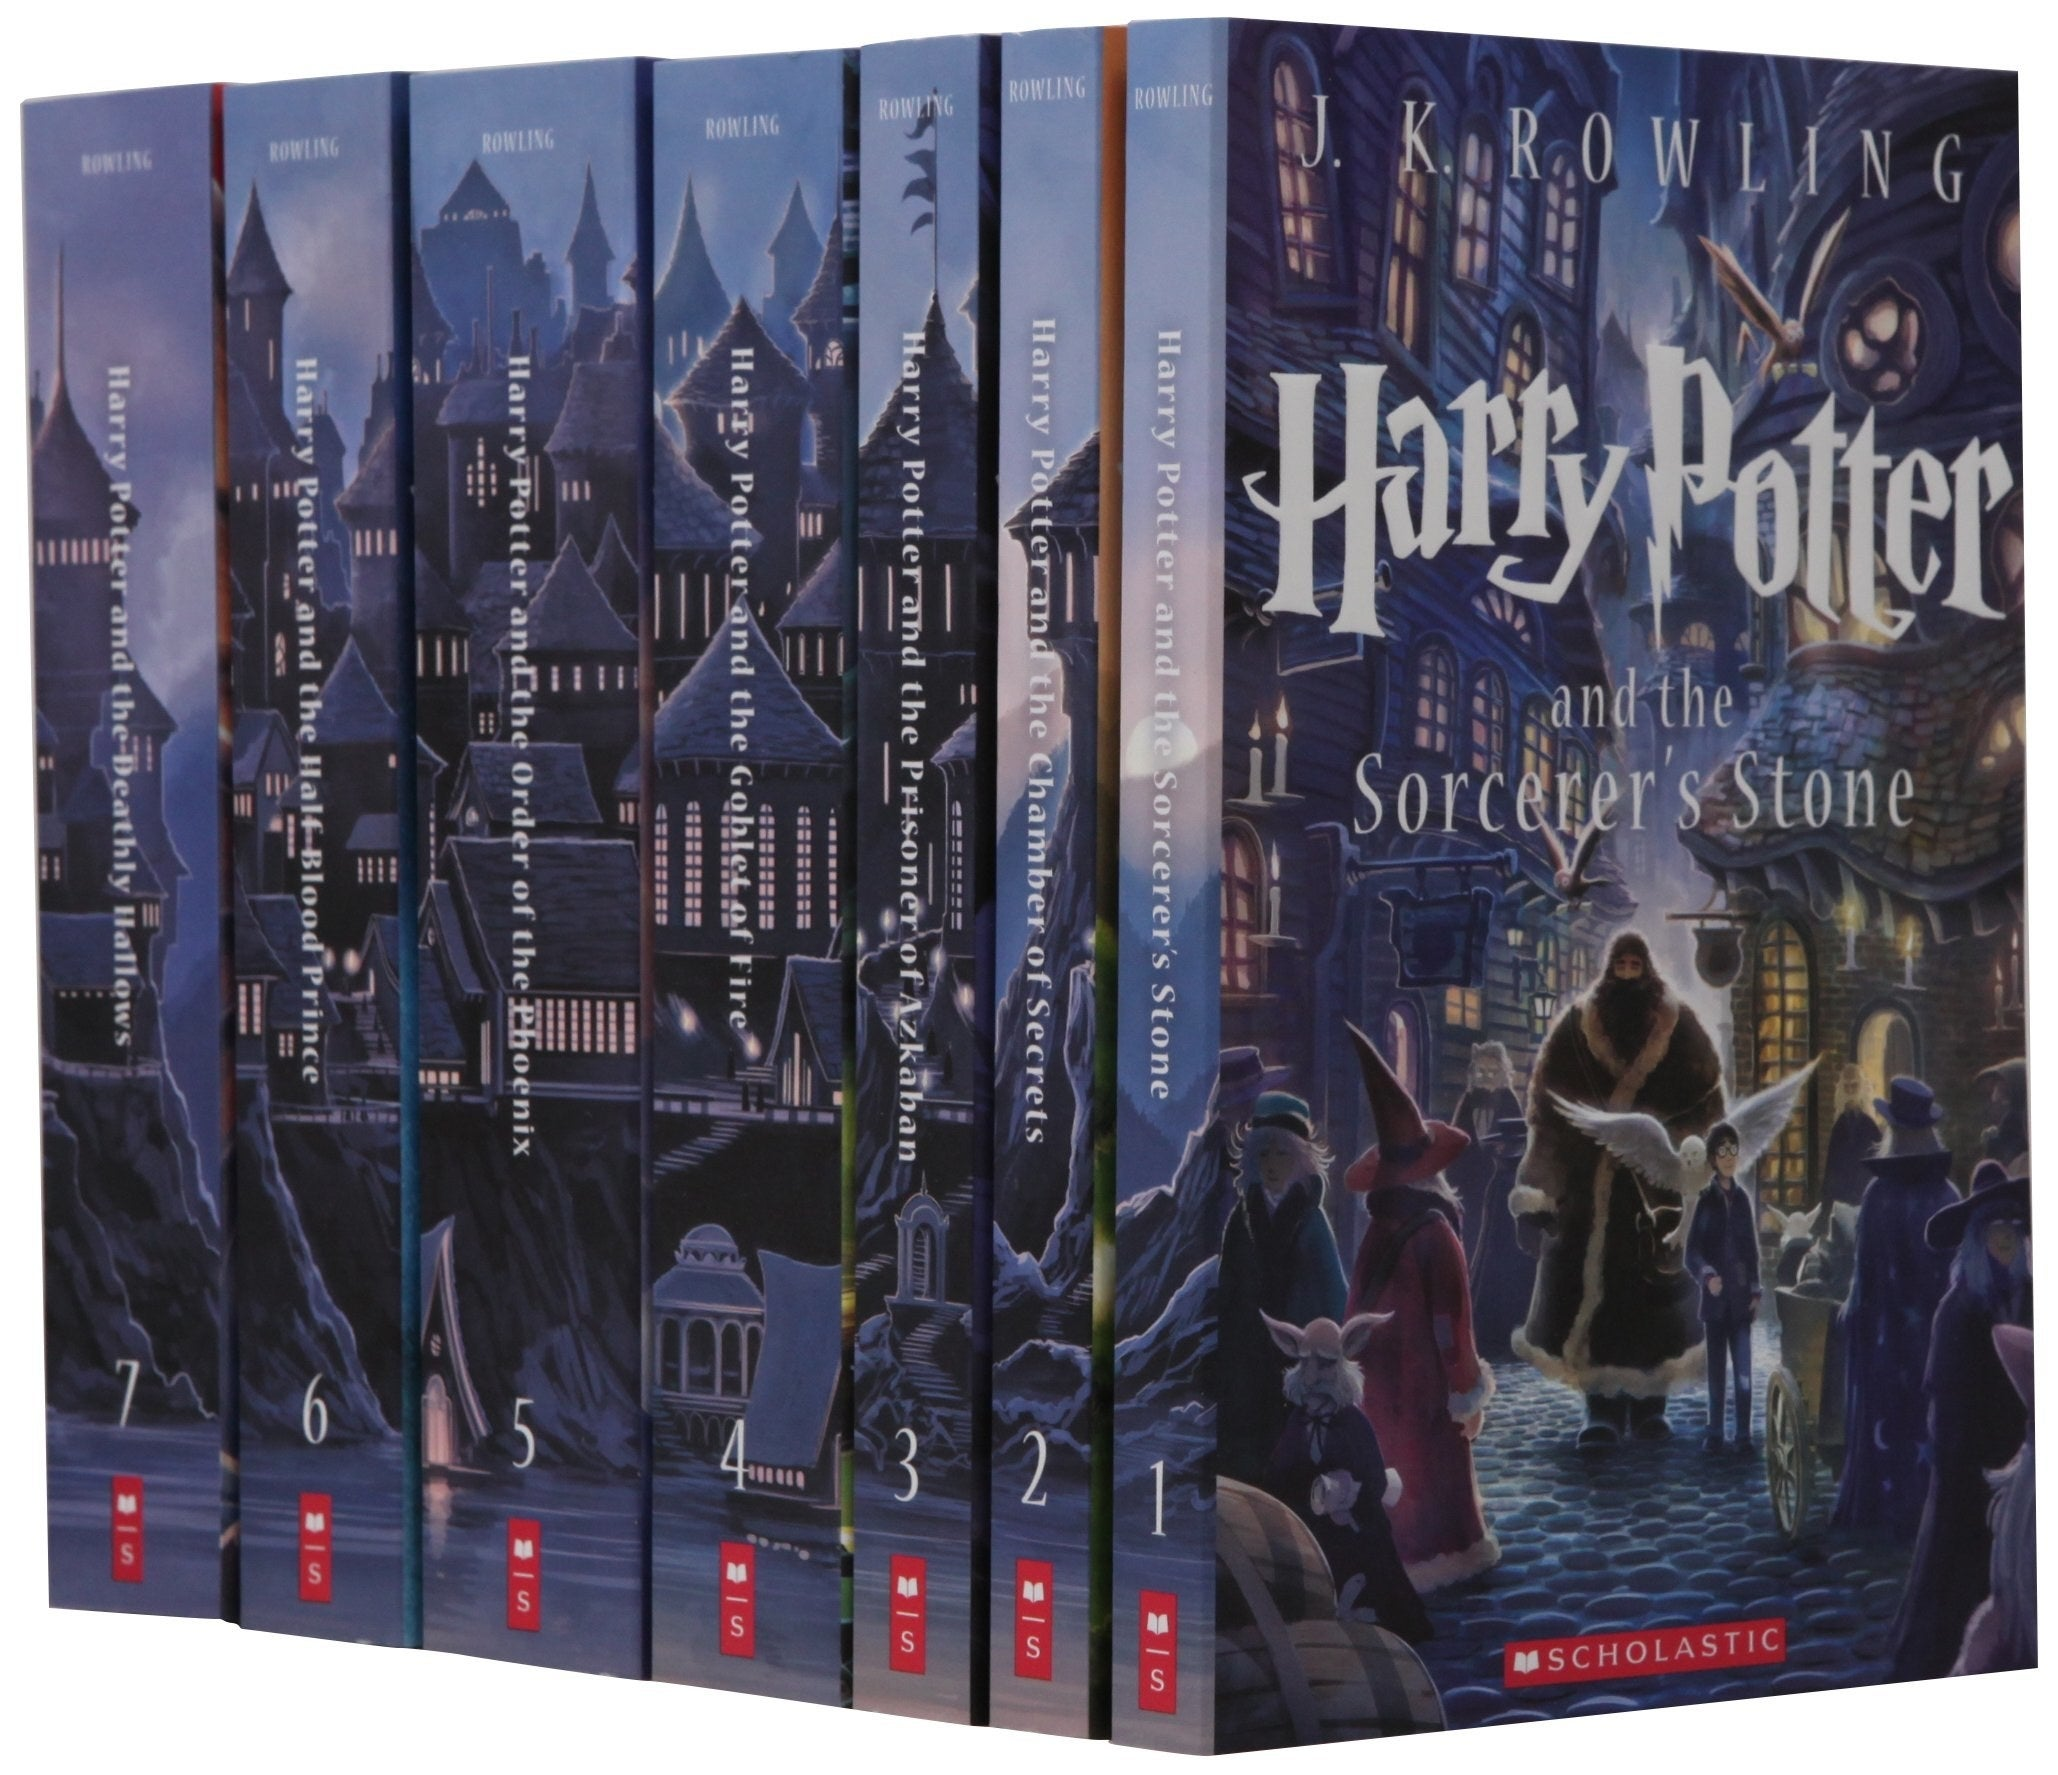 The box set of Harry Potter